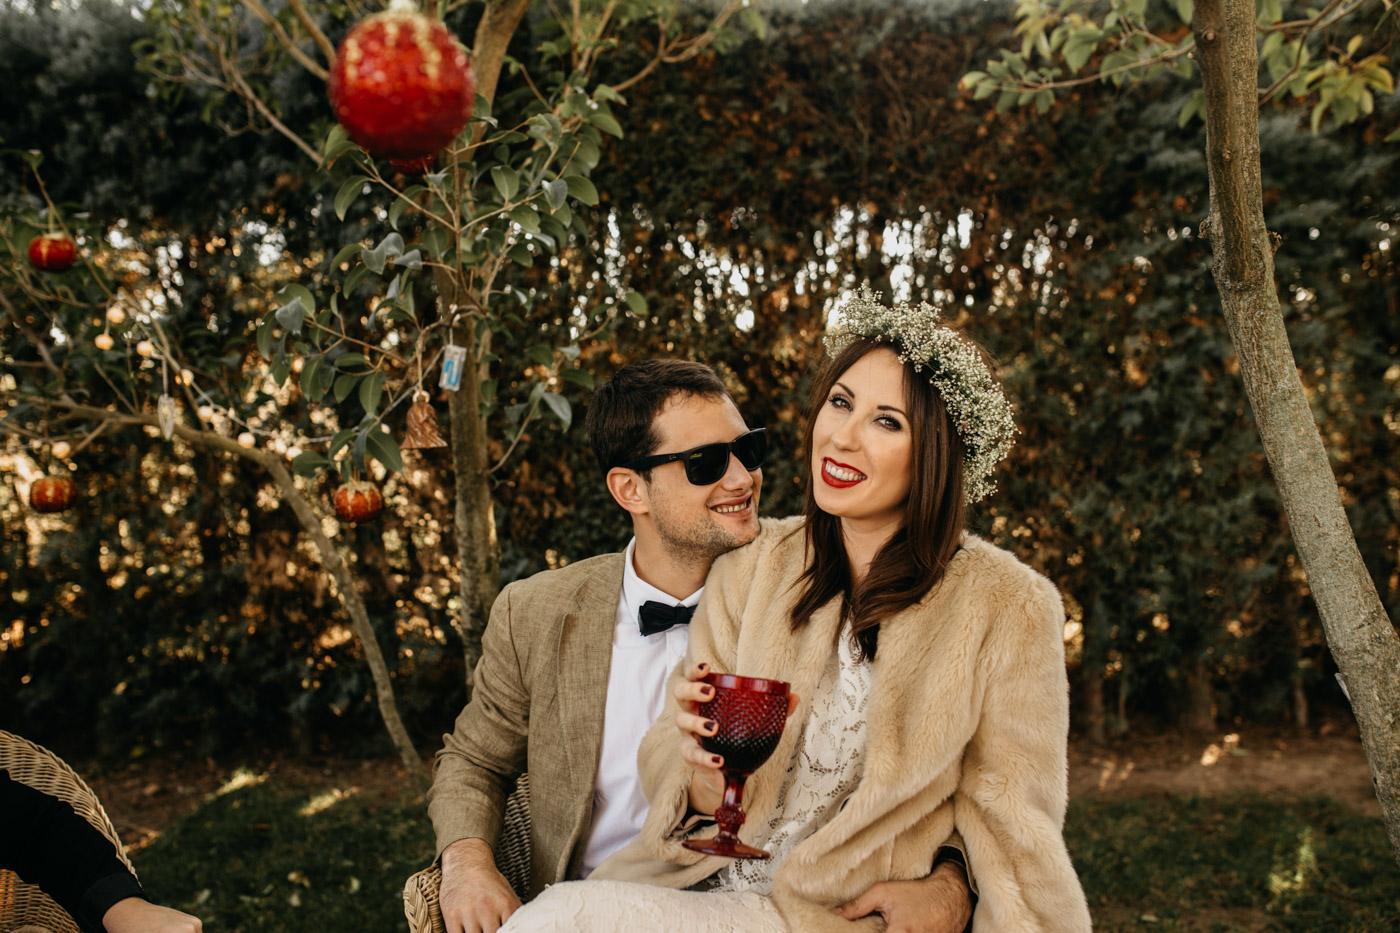 Velvet-Hush-fotografos-boda-al-aire-libre-madrid-068